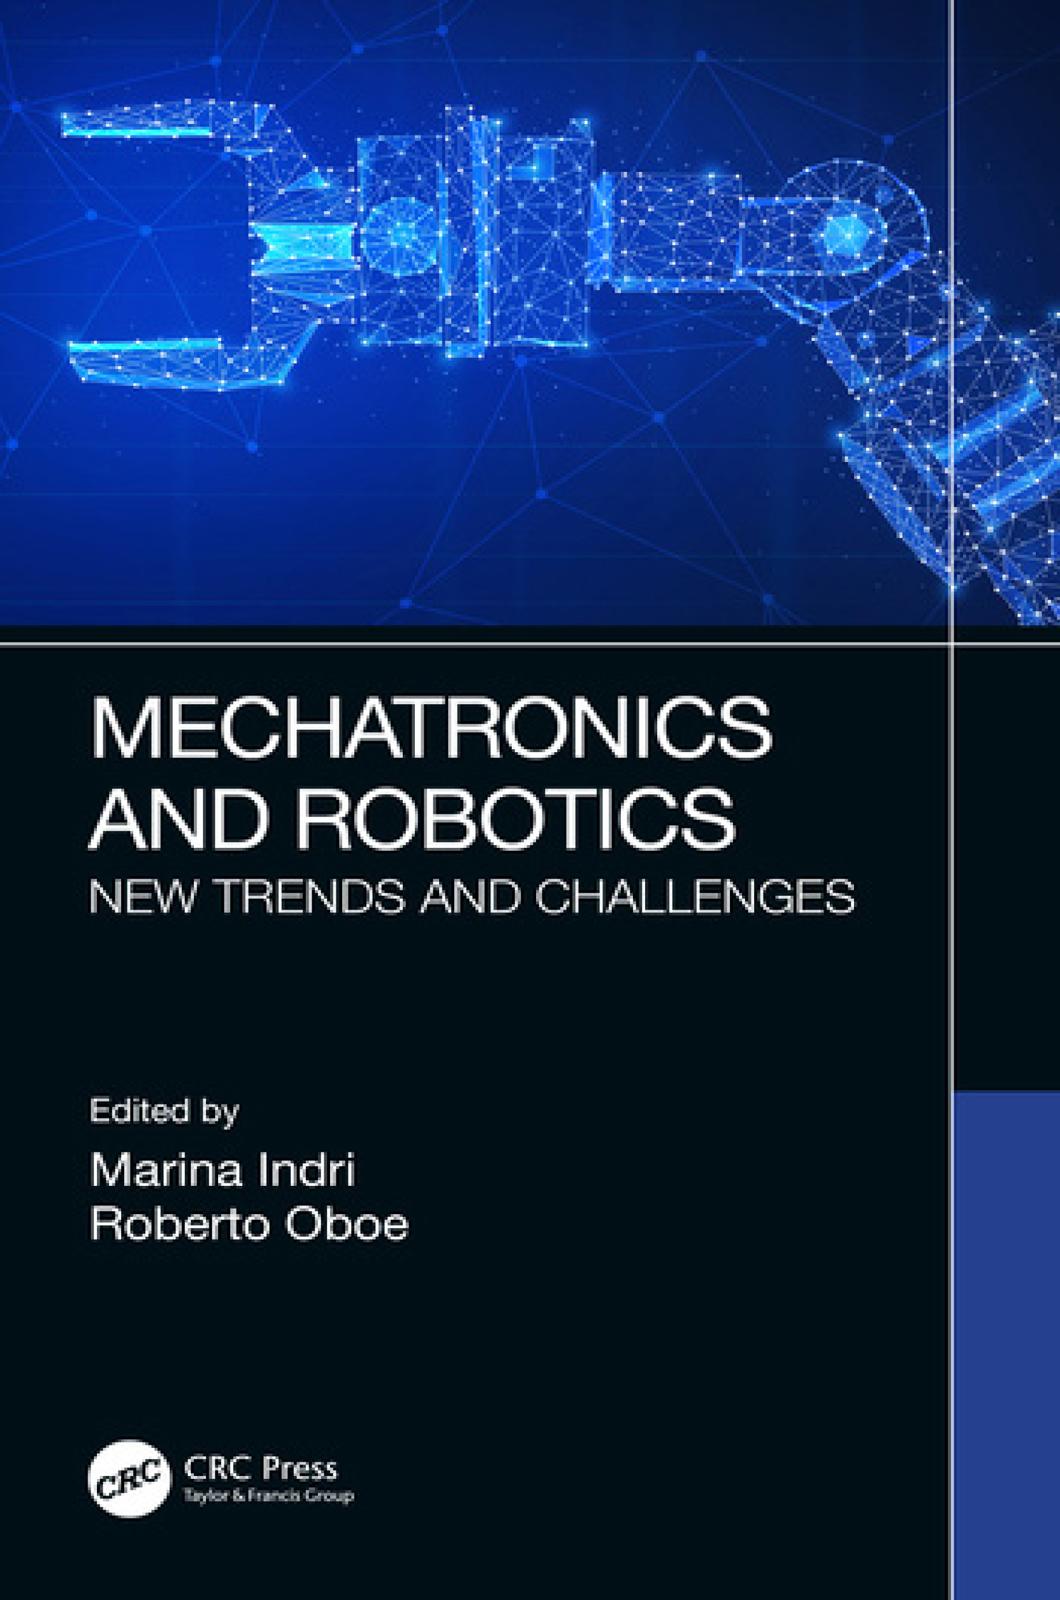 Mechatronics and Robotics - New Trends and Challenges